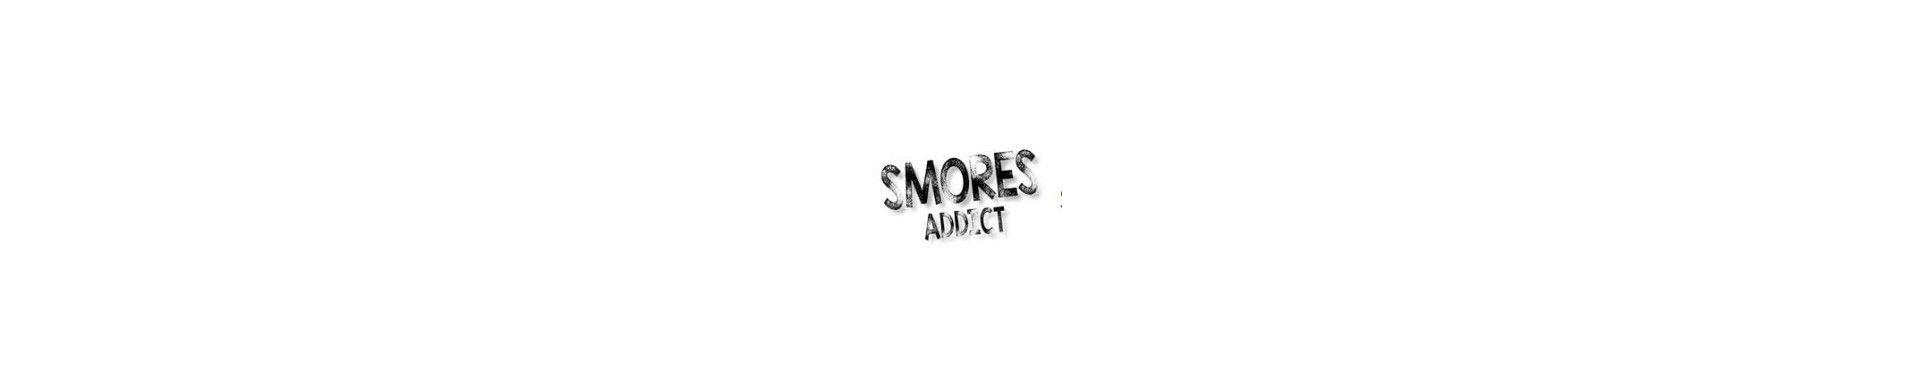 Smores Addict (Aroma)